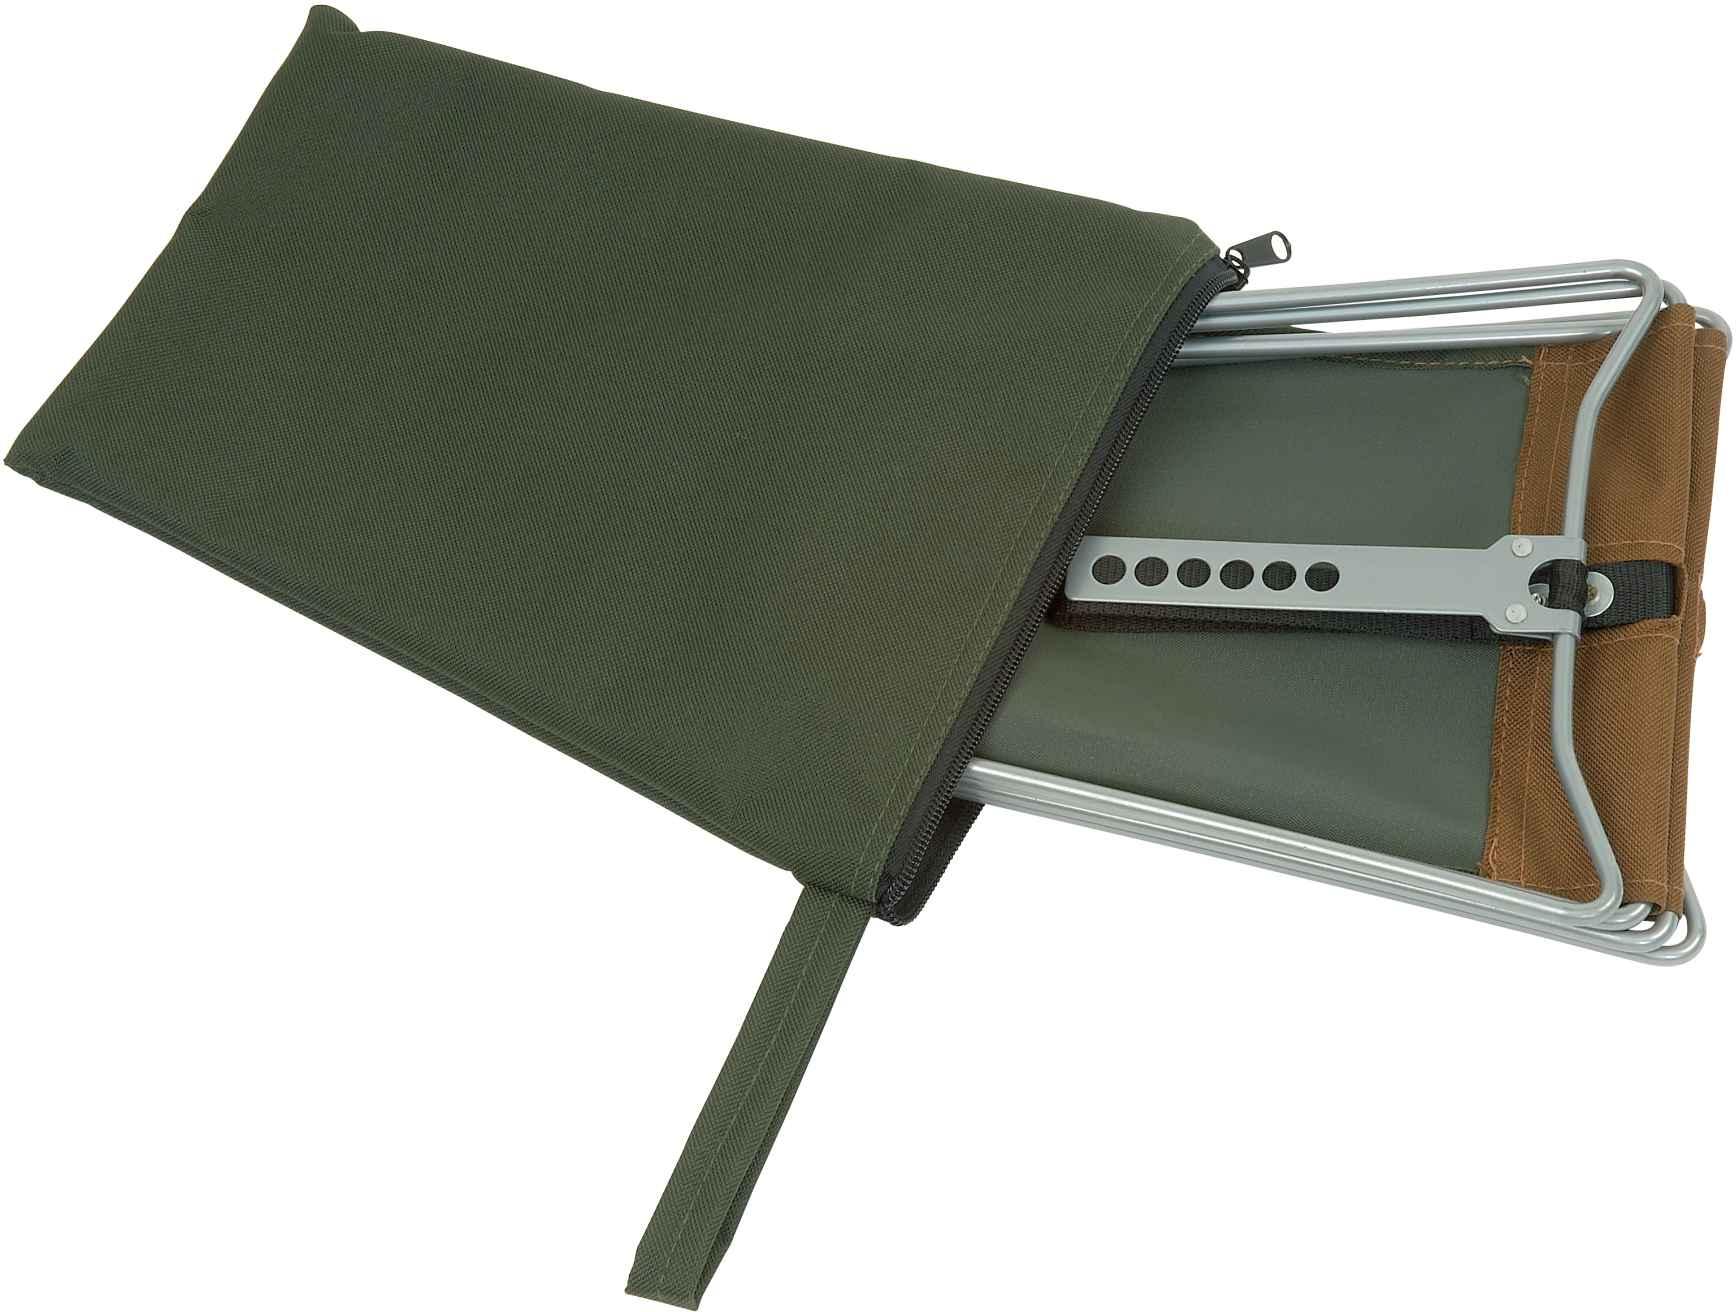 9984009 Zebco Pro Staff BP Folding Rucksack Chair